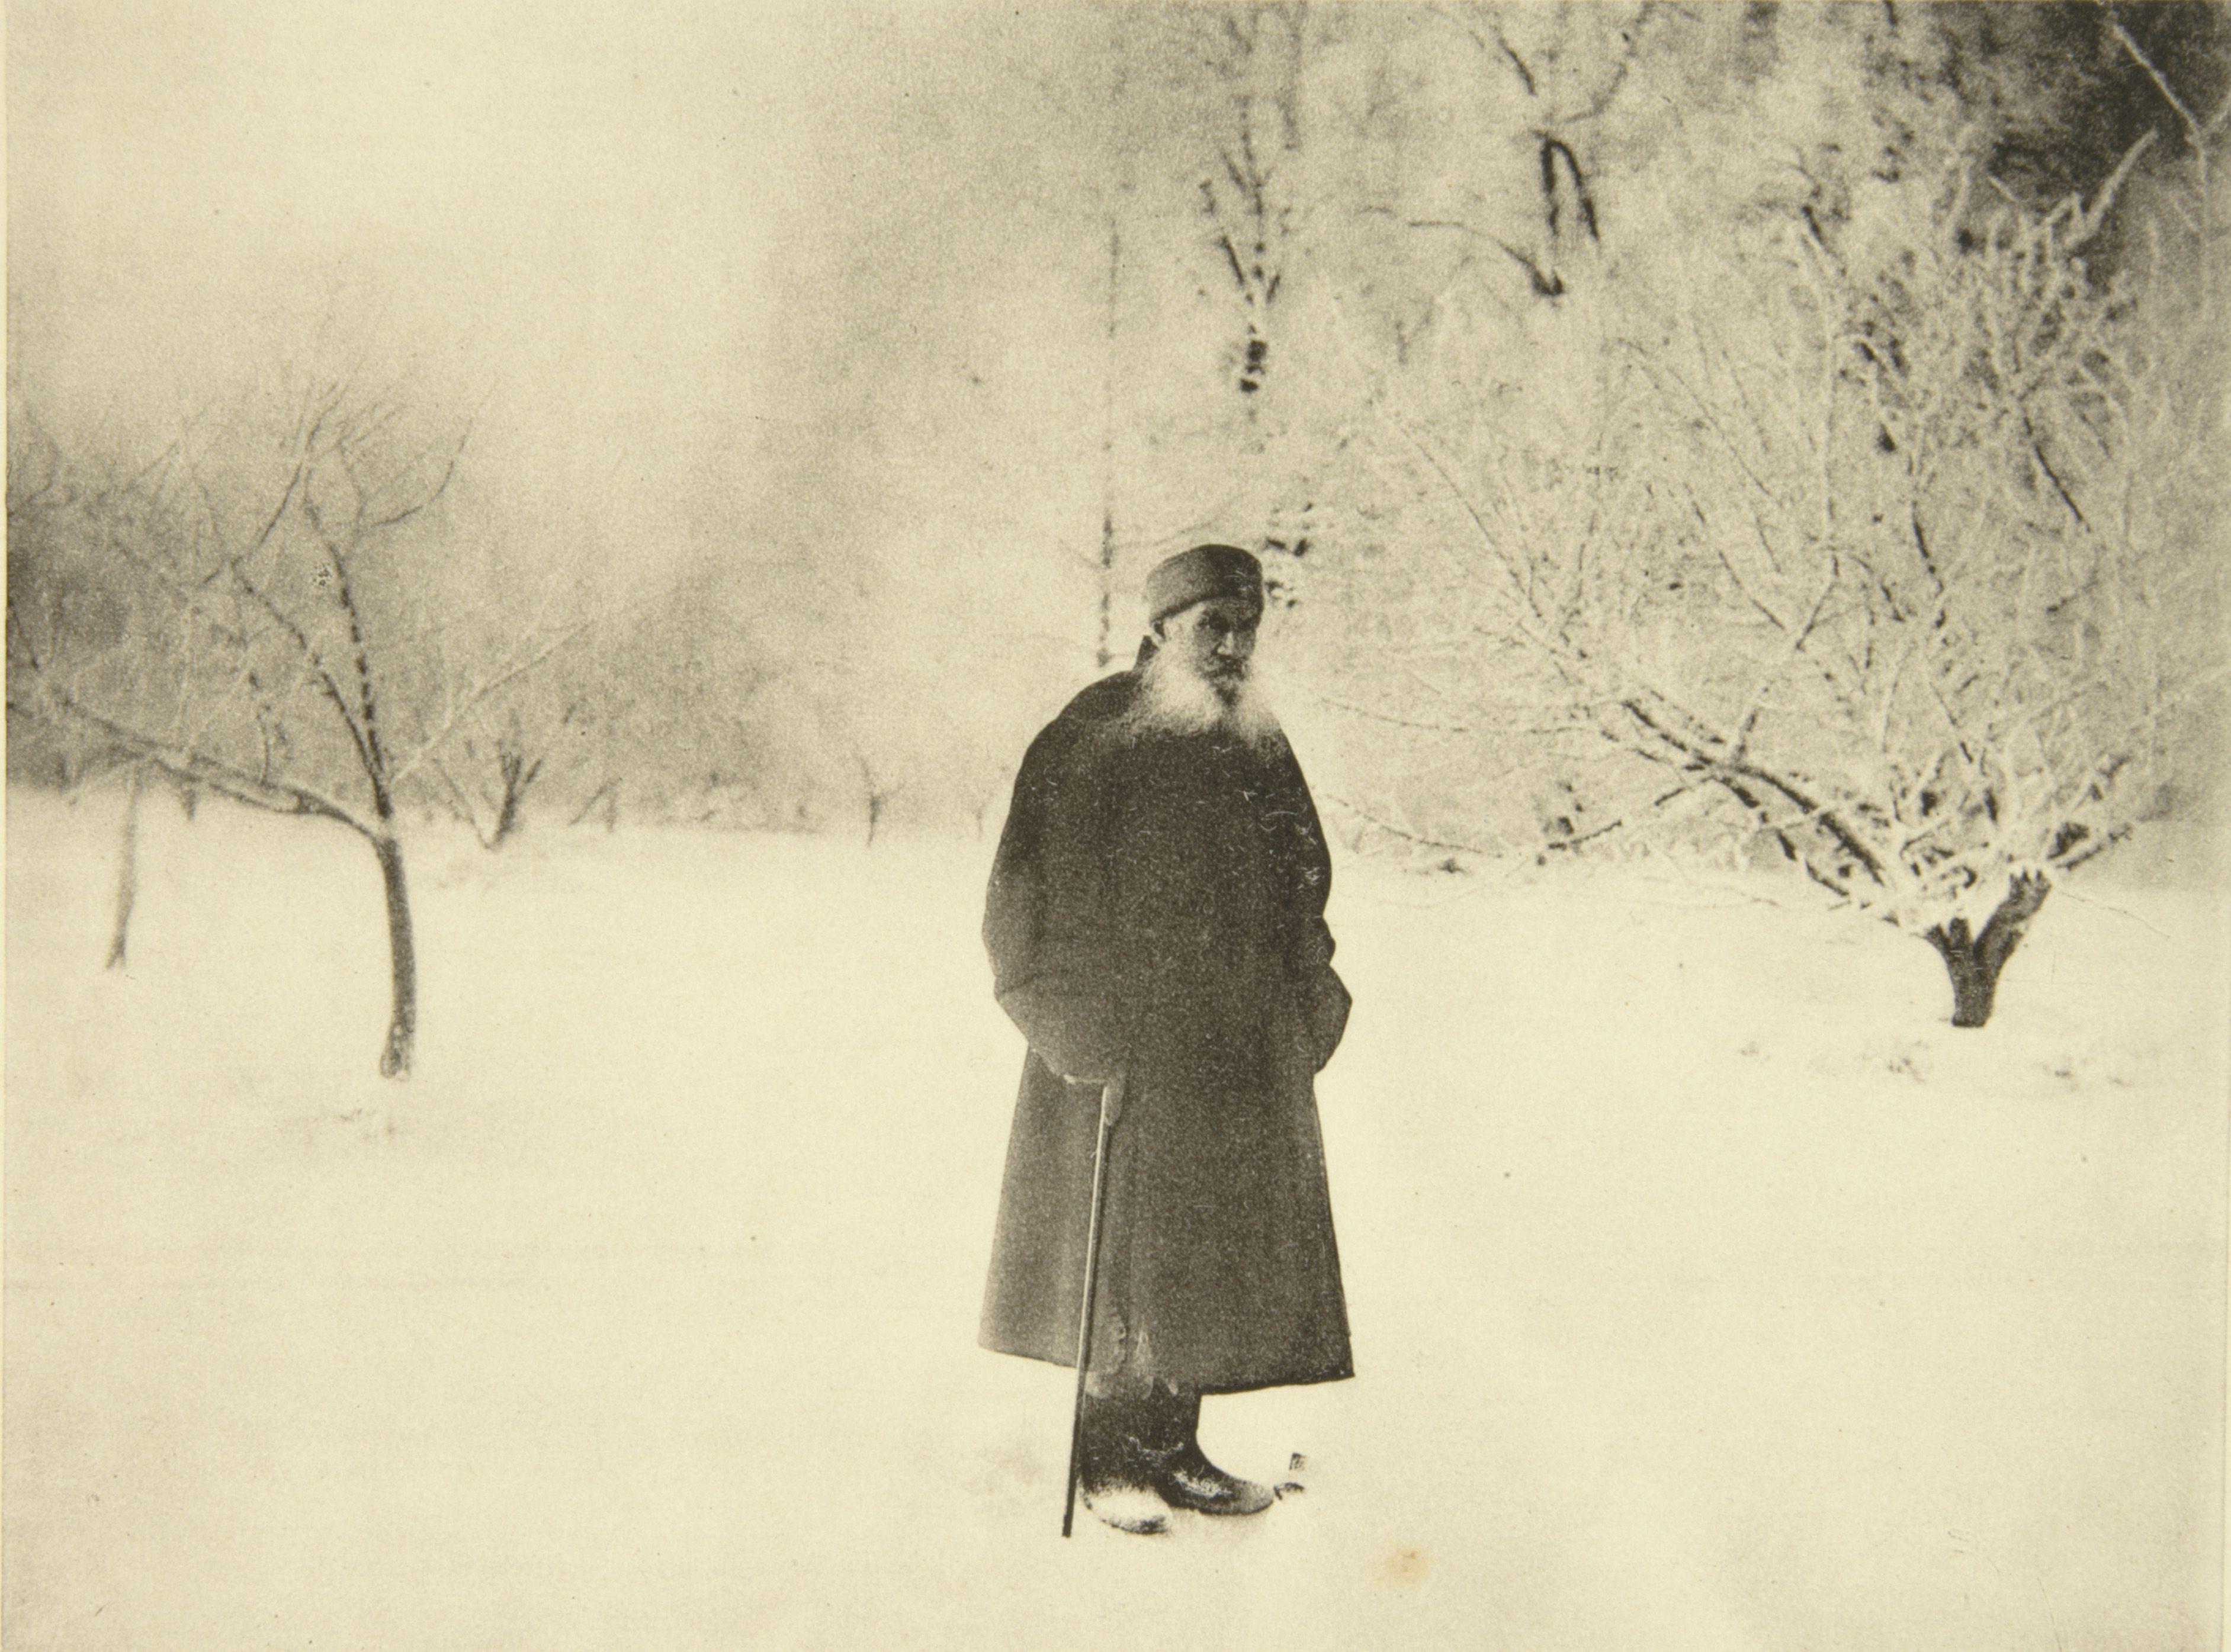 Russian author Leo Tolstoy taking a winter walk, 1900s. Artist: Sophia Tolstaya